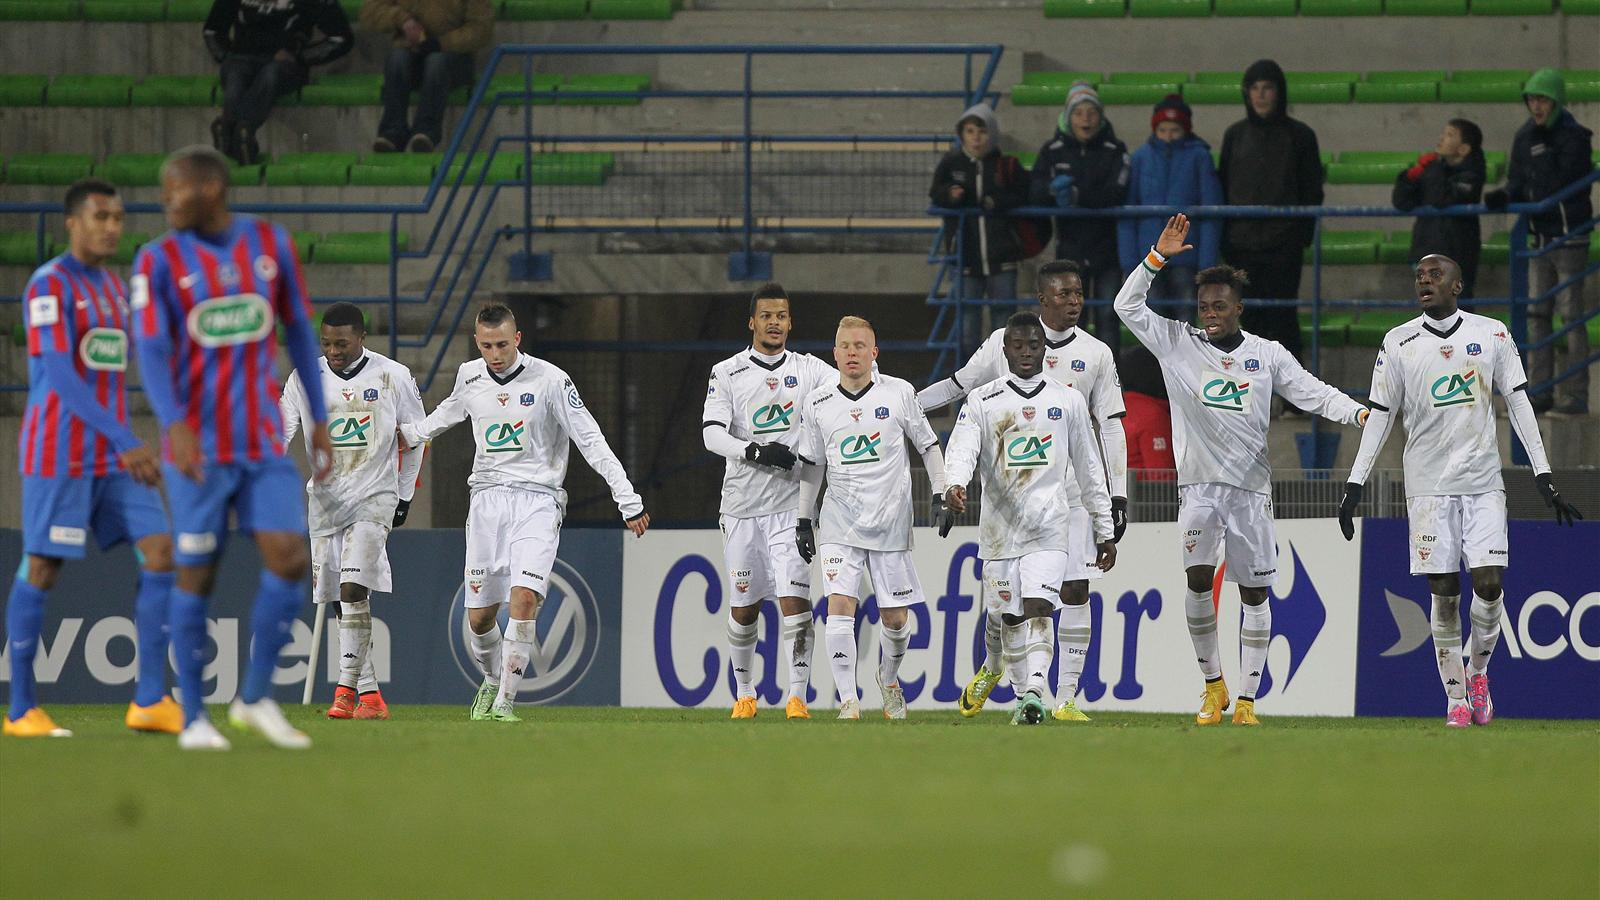 En direct live caen dijon coupe de france 4 - Resultats coupe de france football 2015 ...